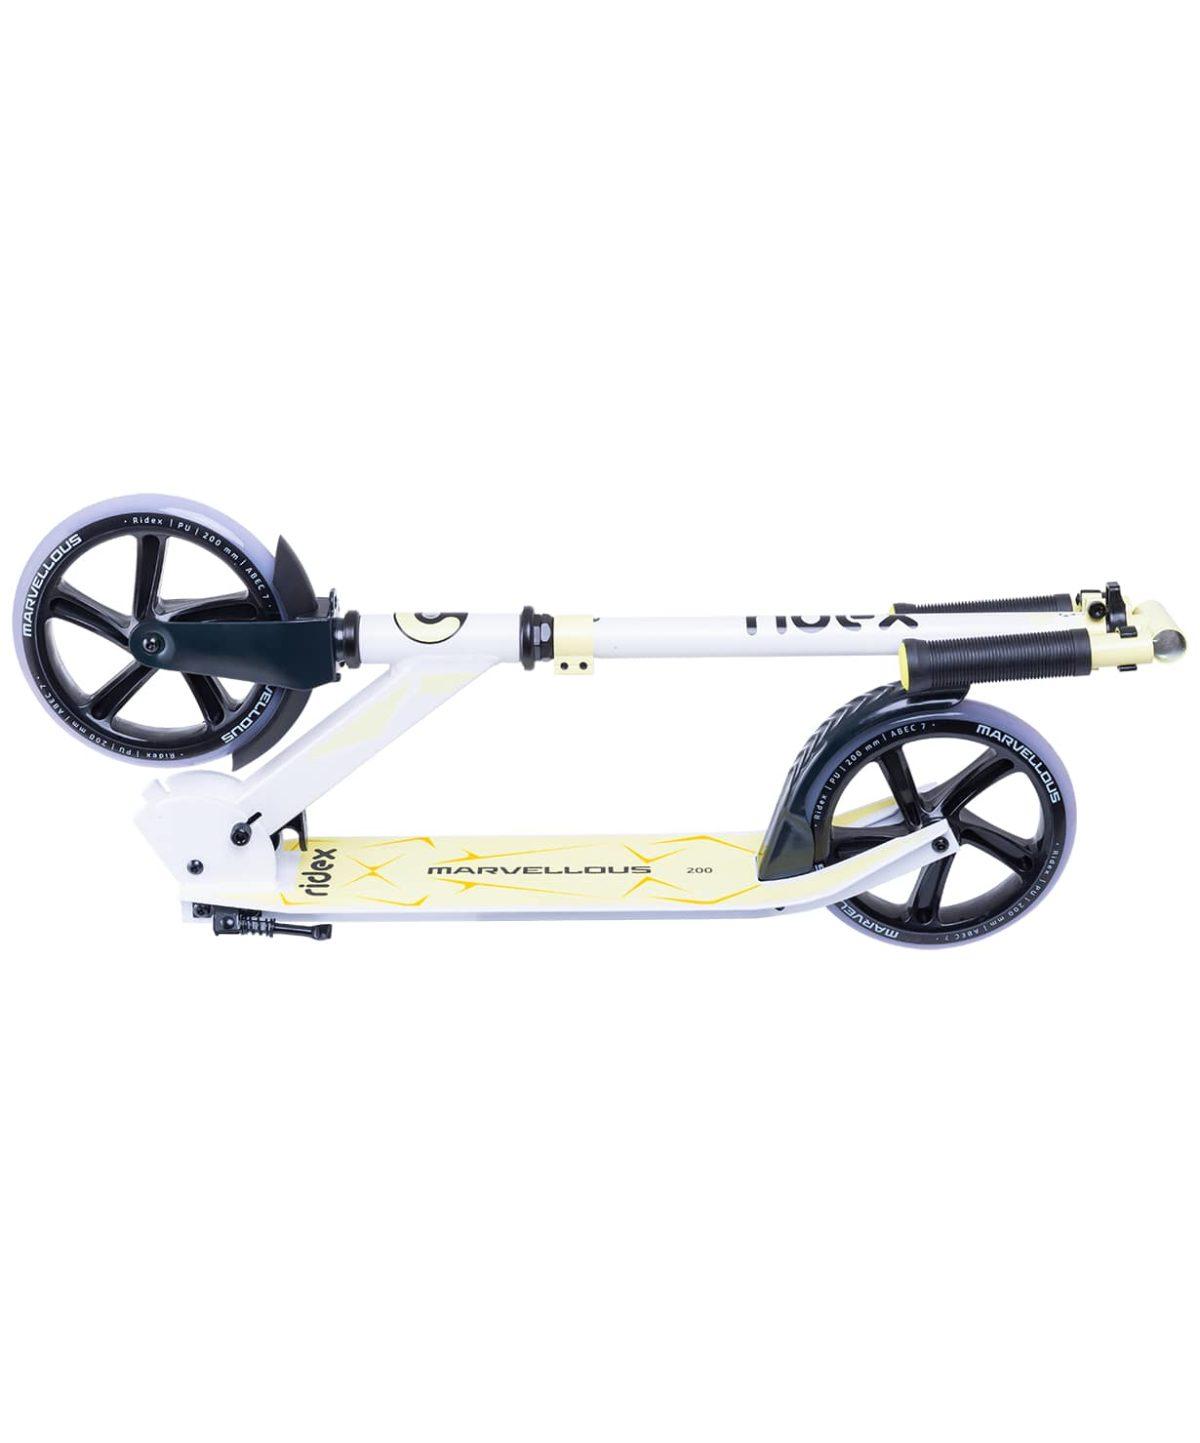 RIDEX Marvellous Самокат 2-х колес. 200 мм  Marvellous: белый/жёлтый - 5